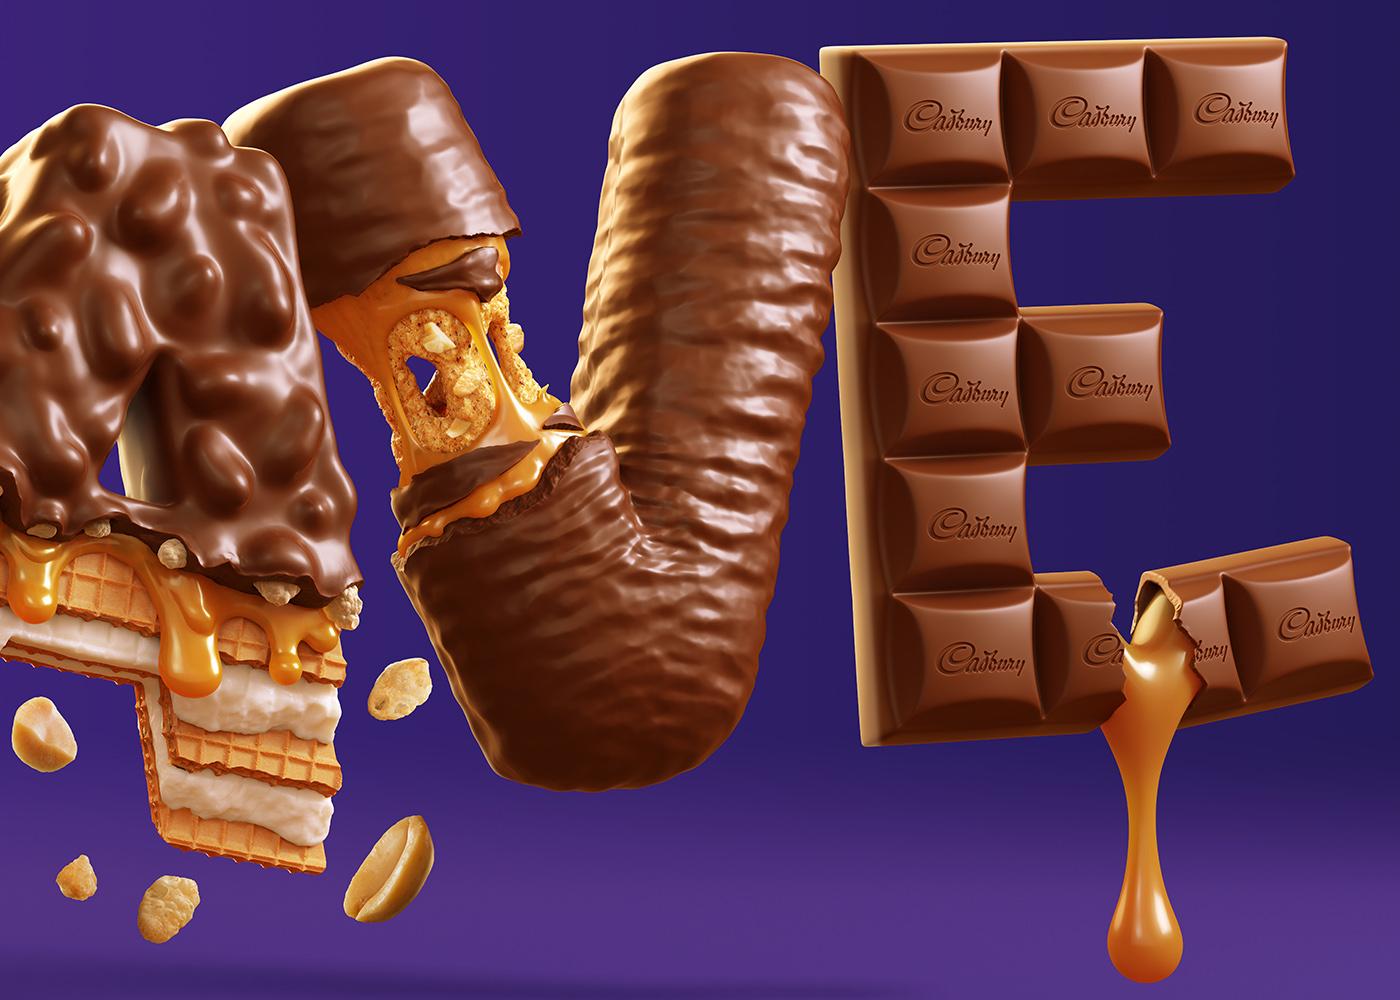 CGI,3D,chocolate,Cadbury,lettering,Food ,crave,caramel,honeycomb,wafer,peanut,Candy